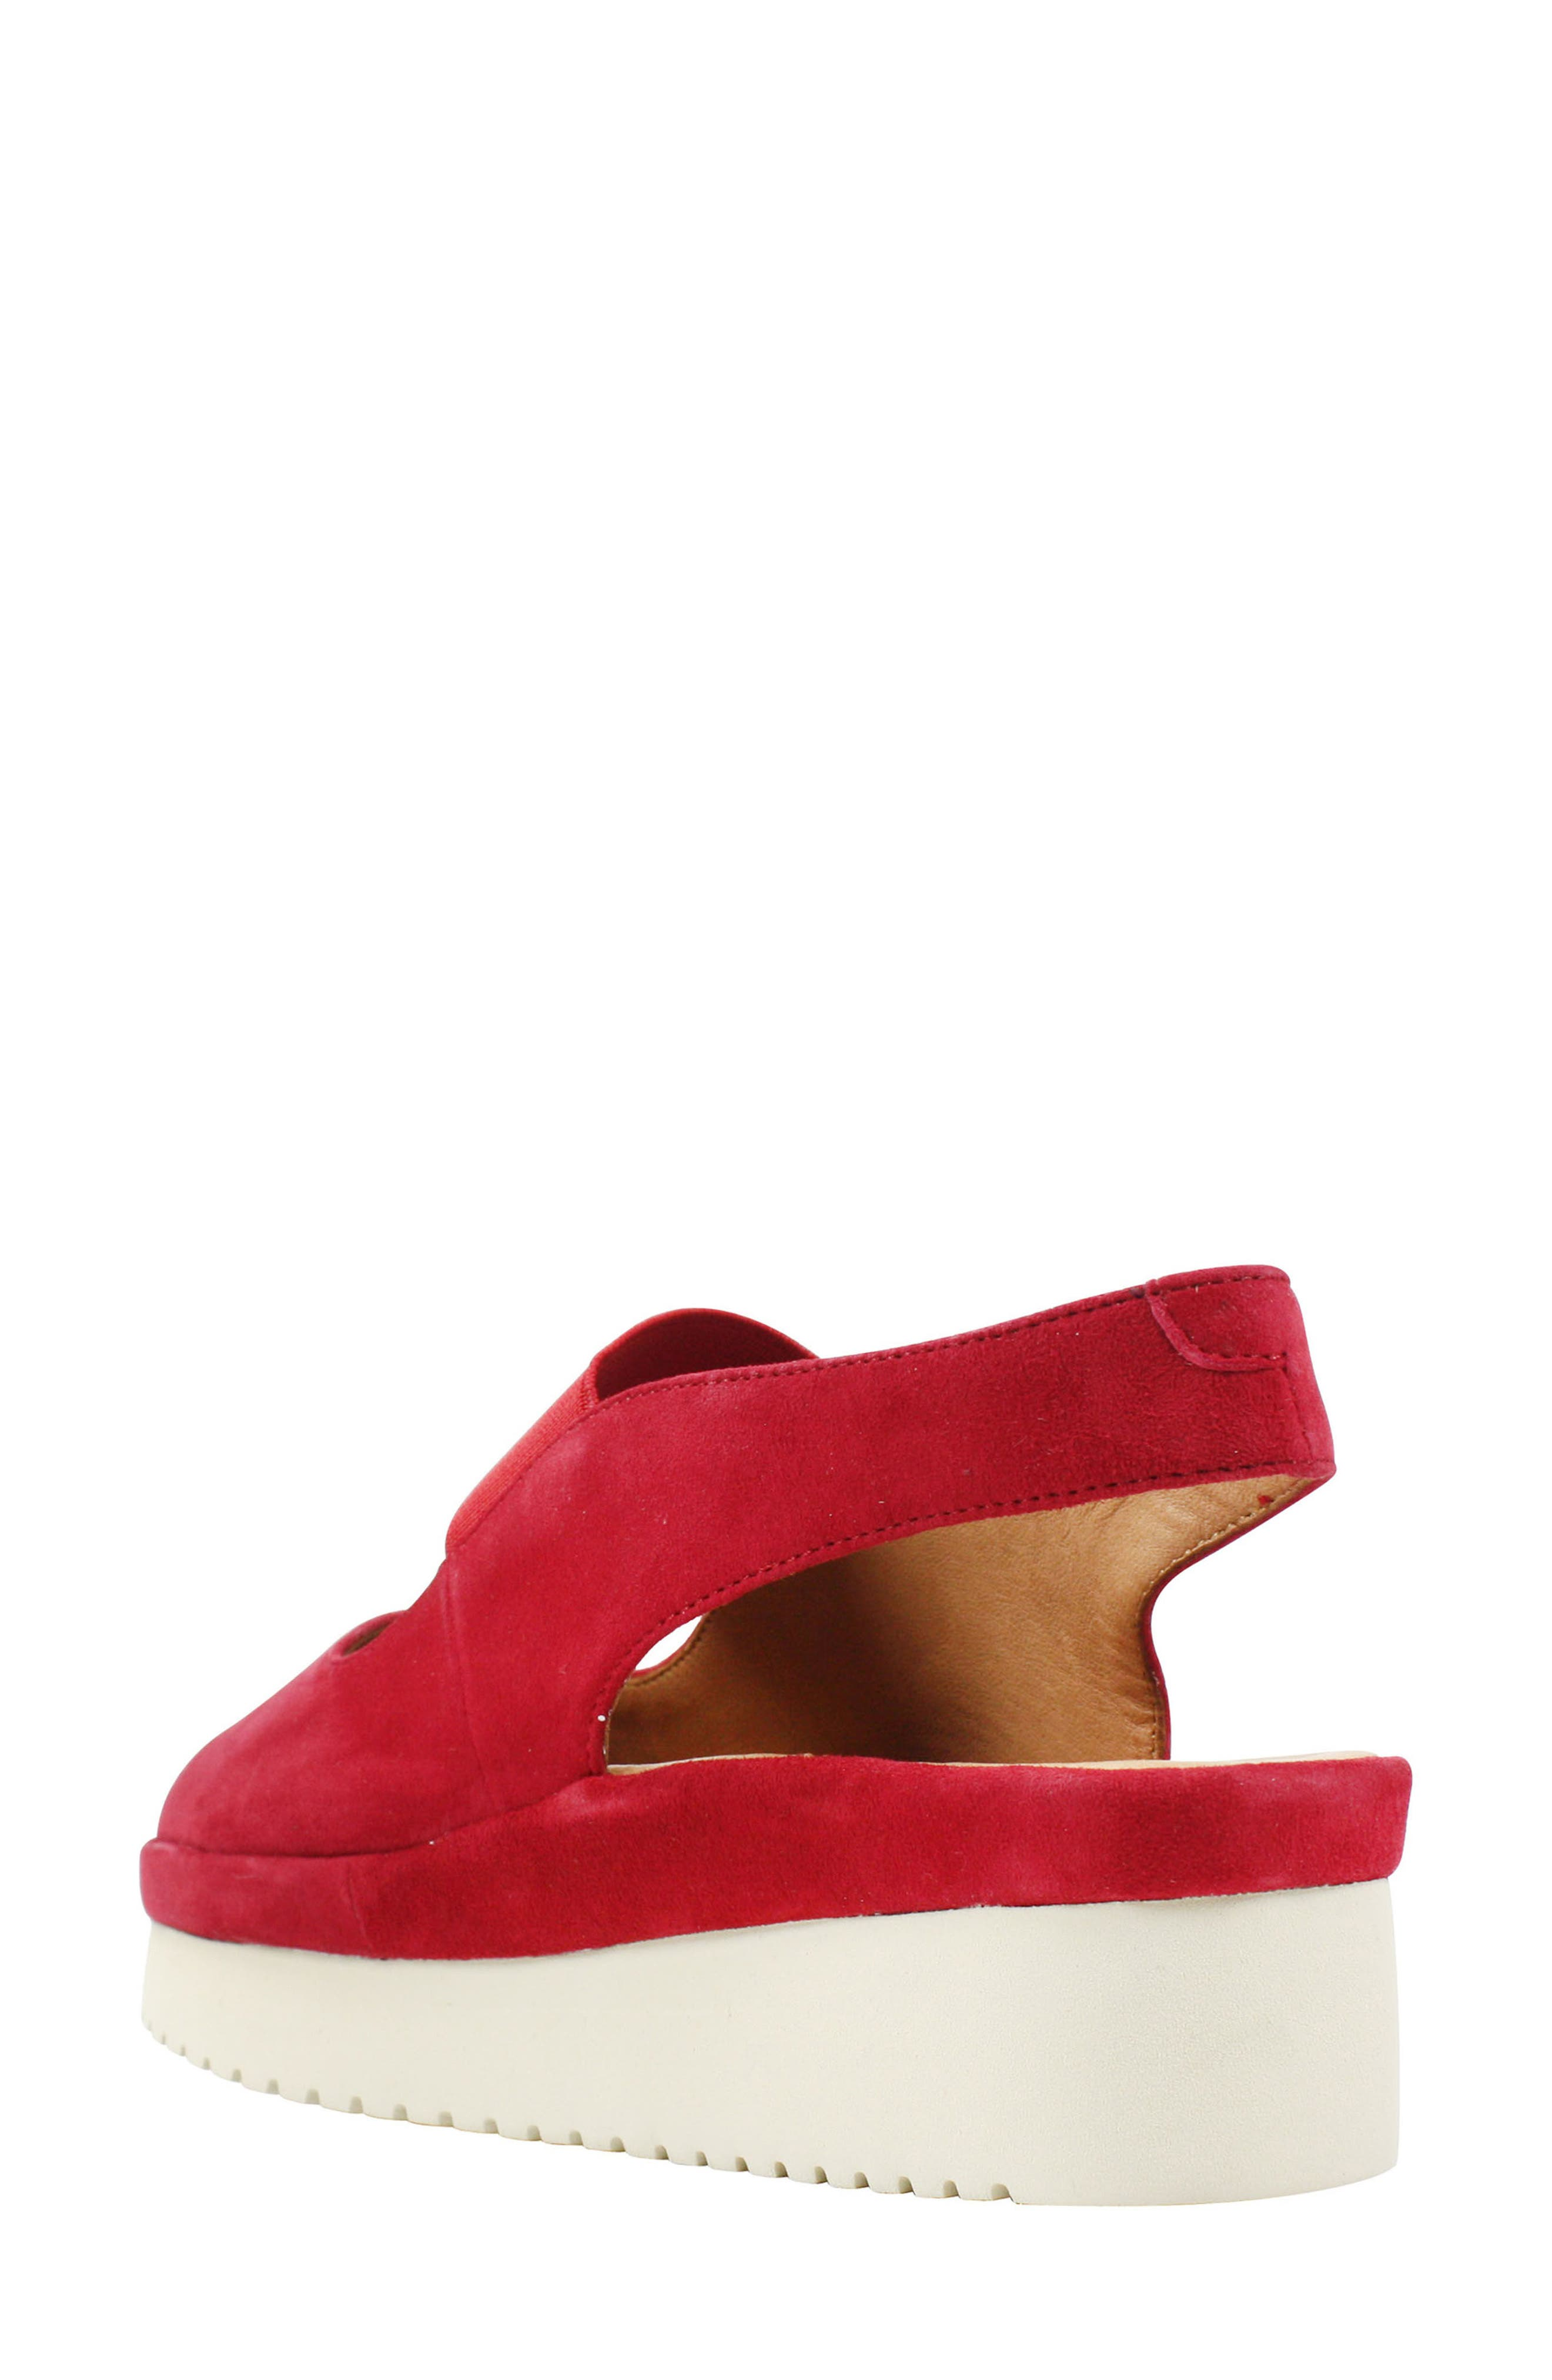 Adalicia Platform Sandal,                             Alternate thumbnail 2, color,                             Bright Red Suede